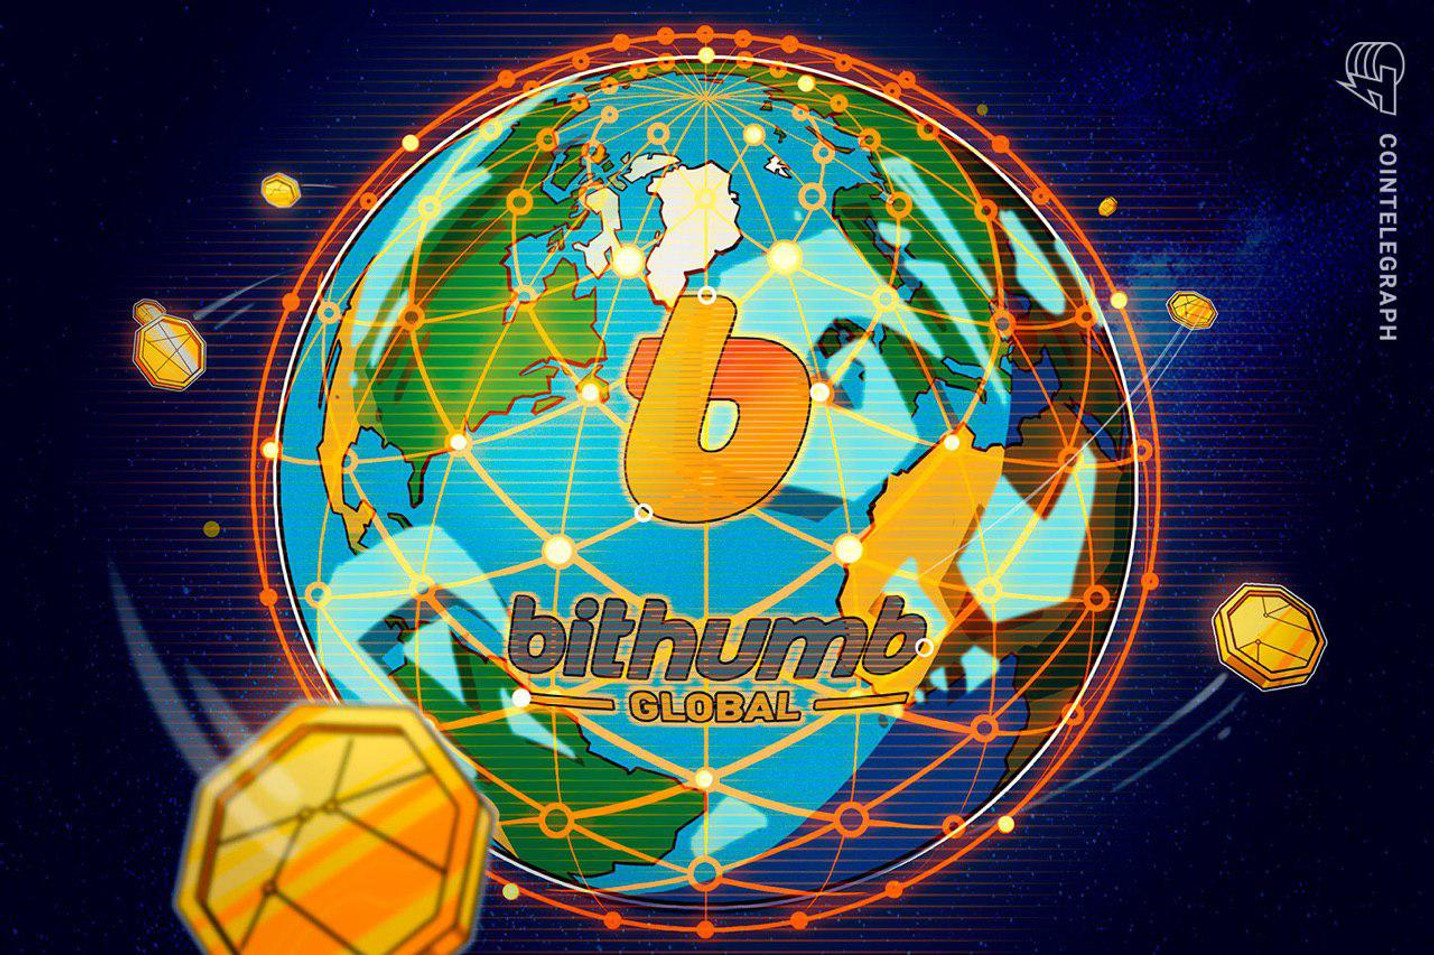 Bithumb Global, el siguiente paso de Bithumb para convertirse en un exchange global